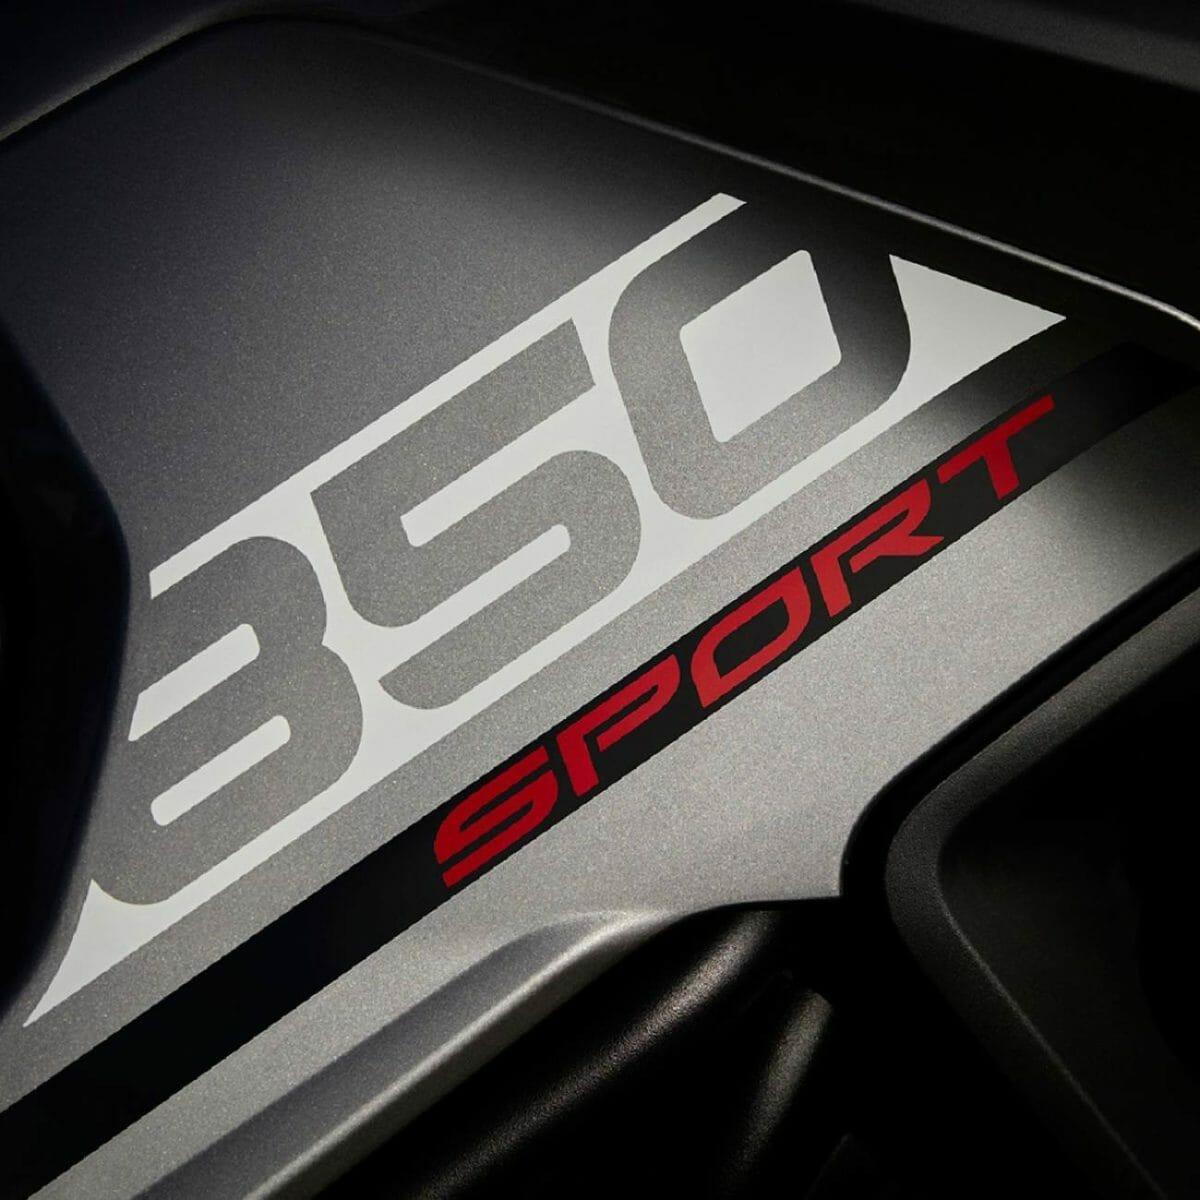 Triumph Tiger 850 Sport teased